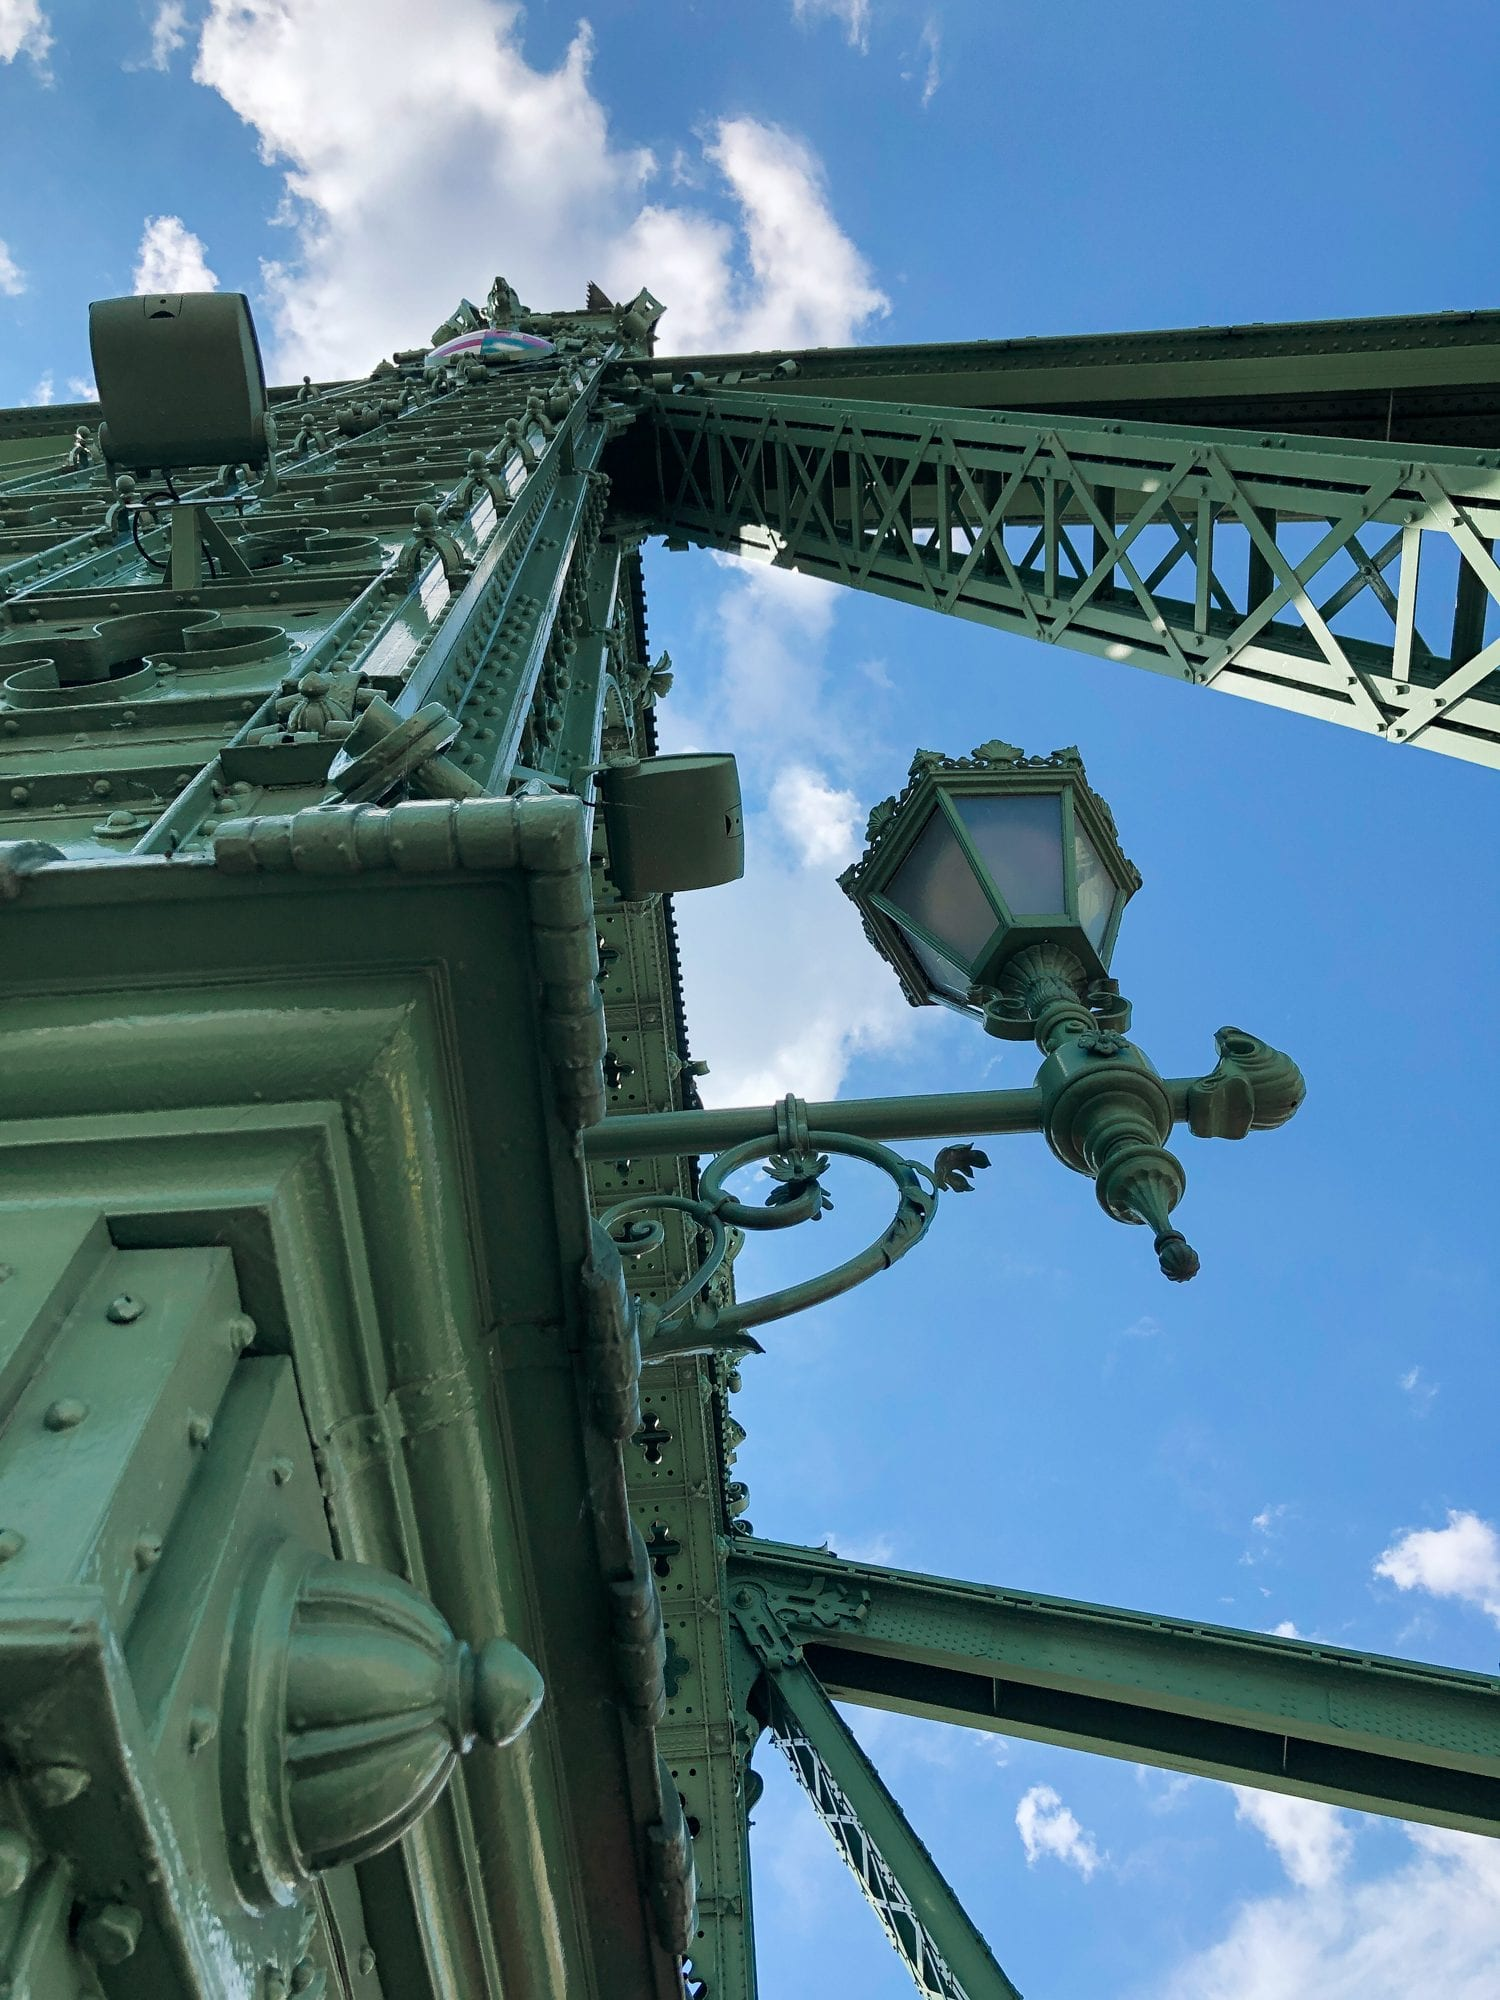 bridge details in budapest